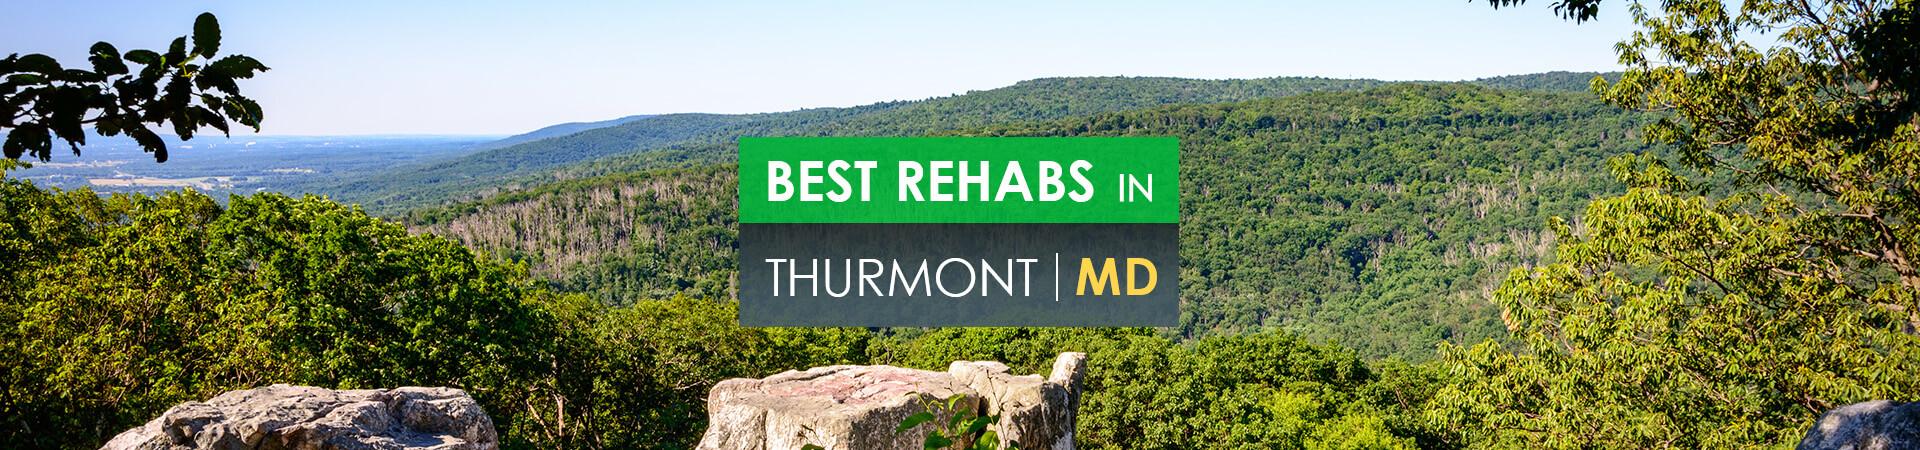 Best rehabs in Thurmont, MD